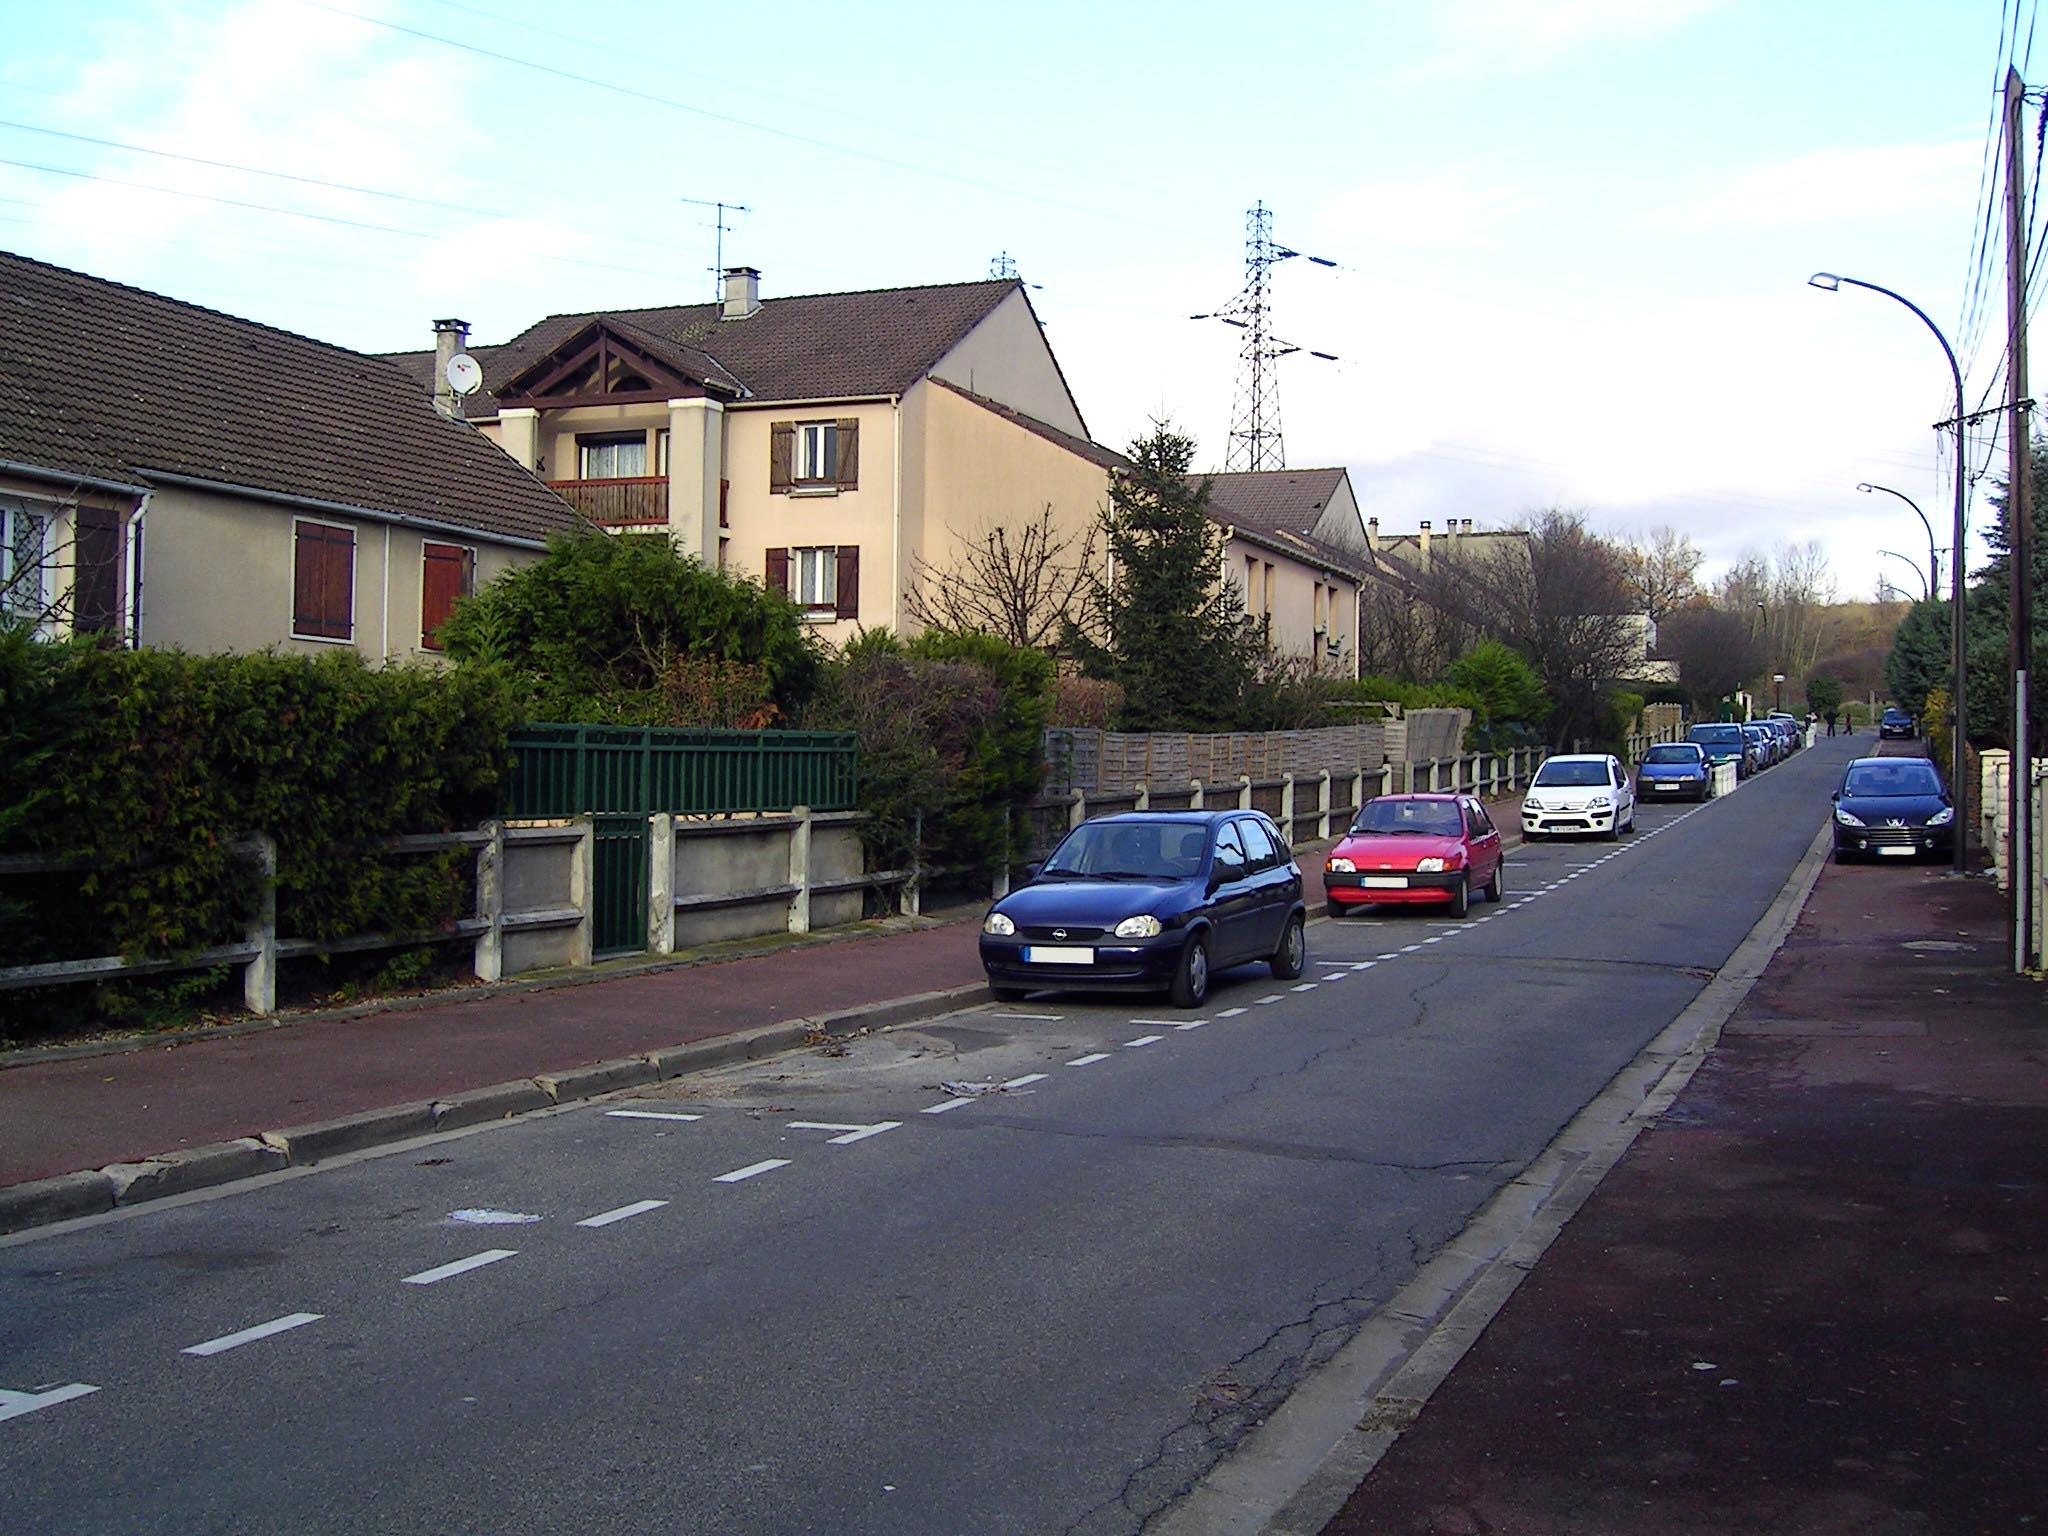 Cmp Livry Gargan concernant file:livry-gargan quartier bellevue01 - wikimedia commons